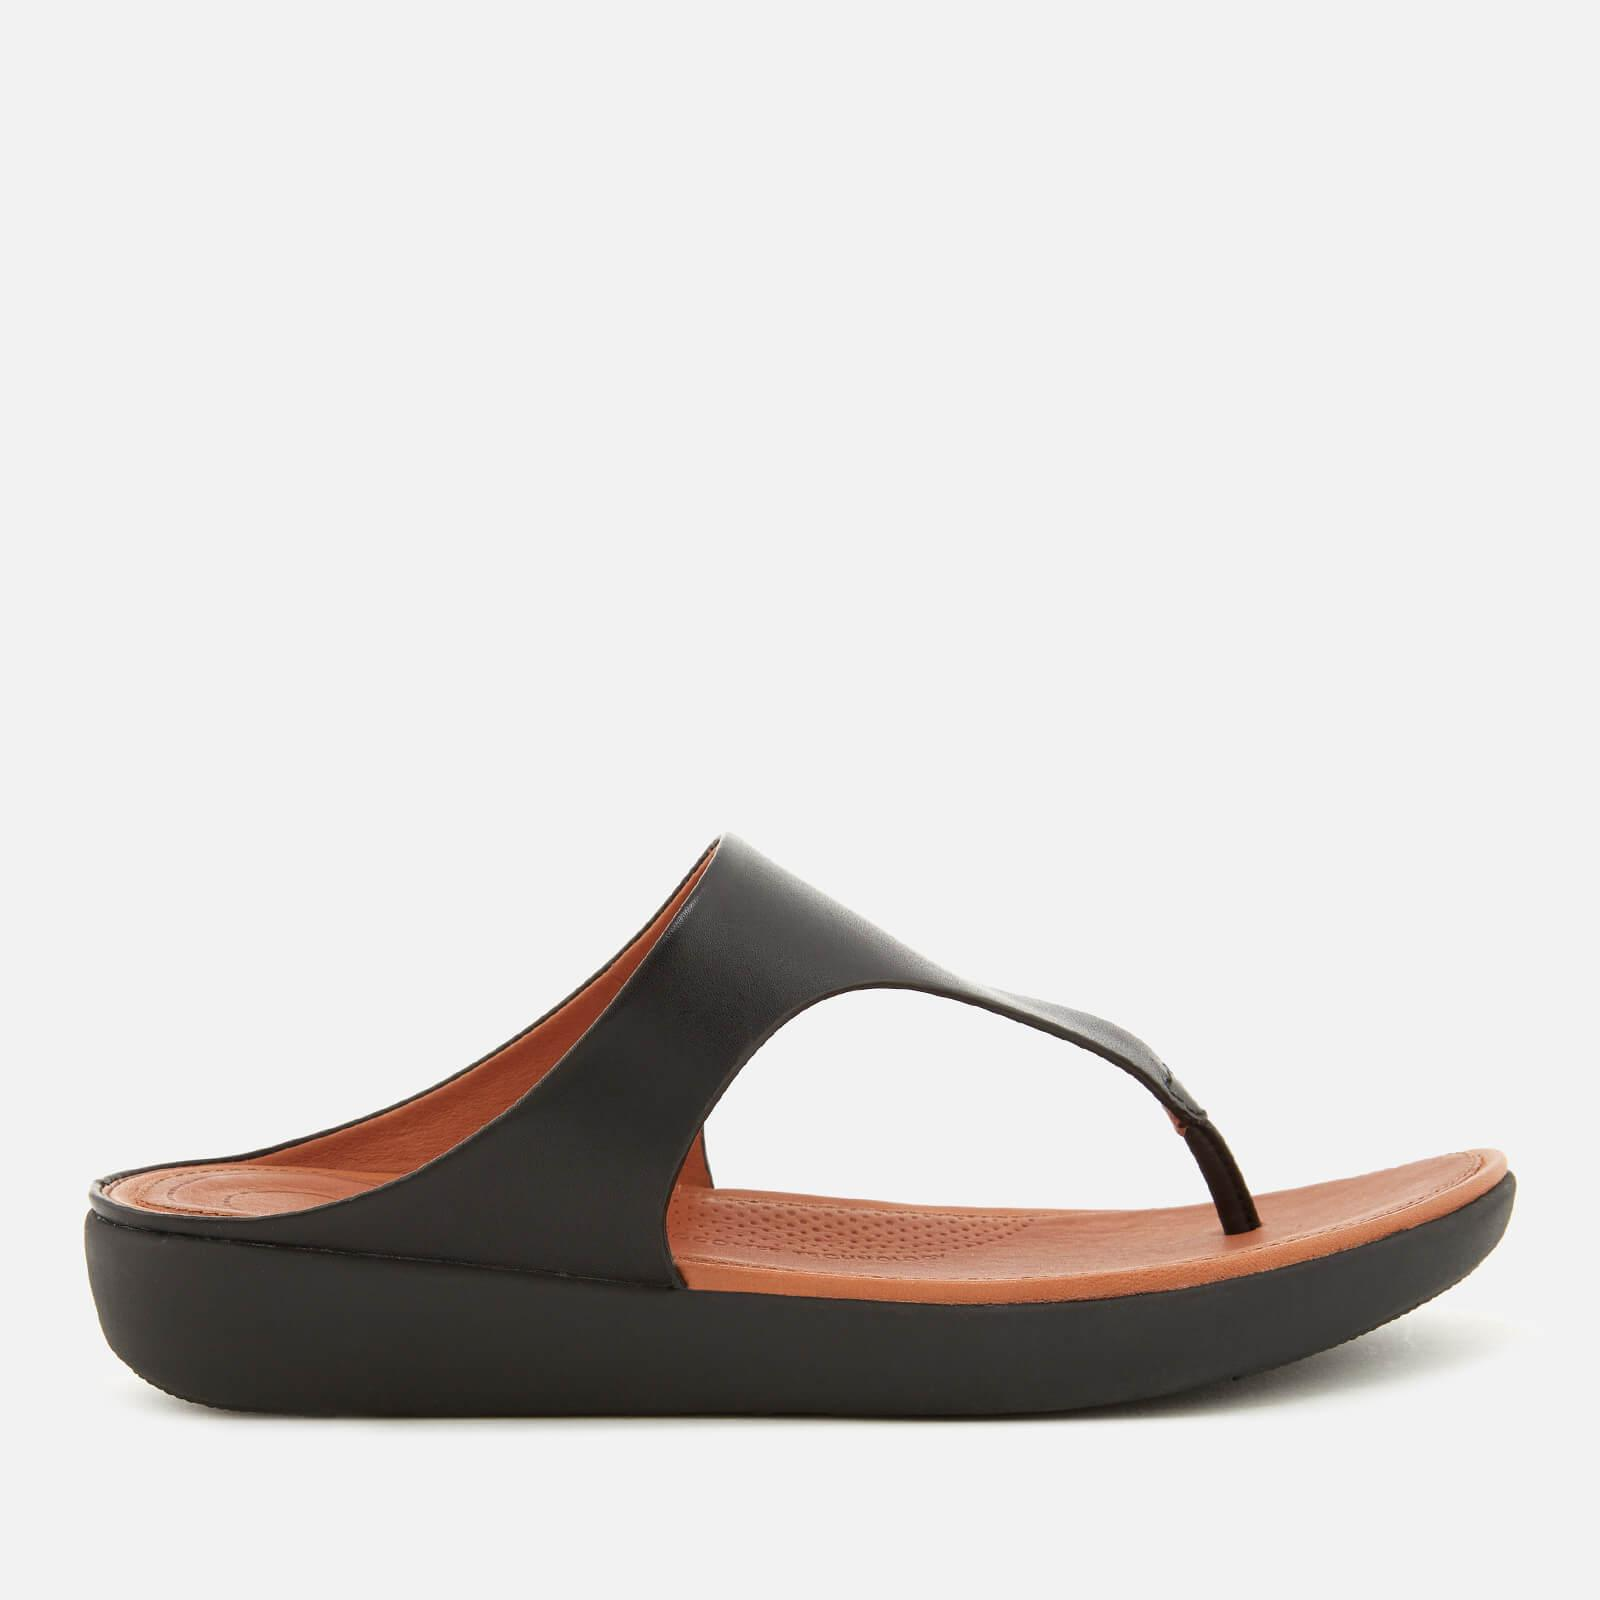 c53e5fbdff32f1 Lyst - Fitflop Banda Ii Leather Toe Post Sandals in Black